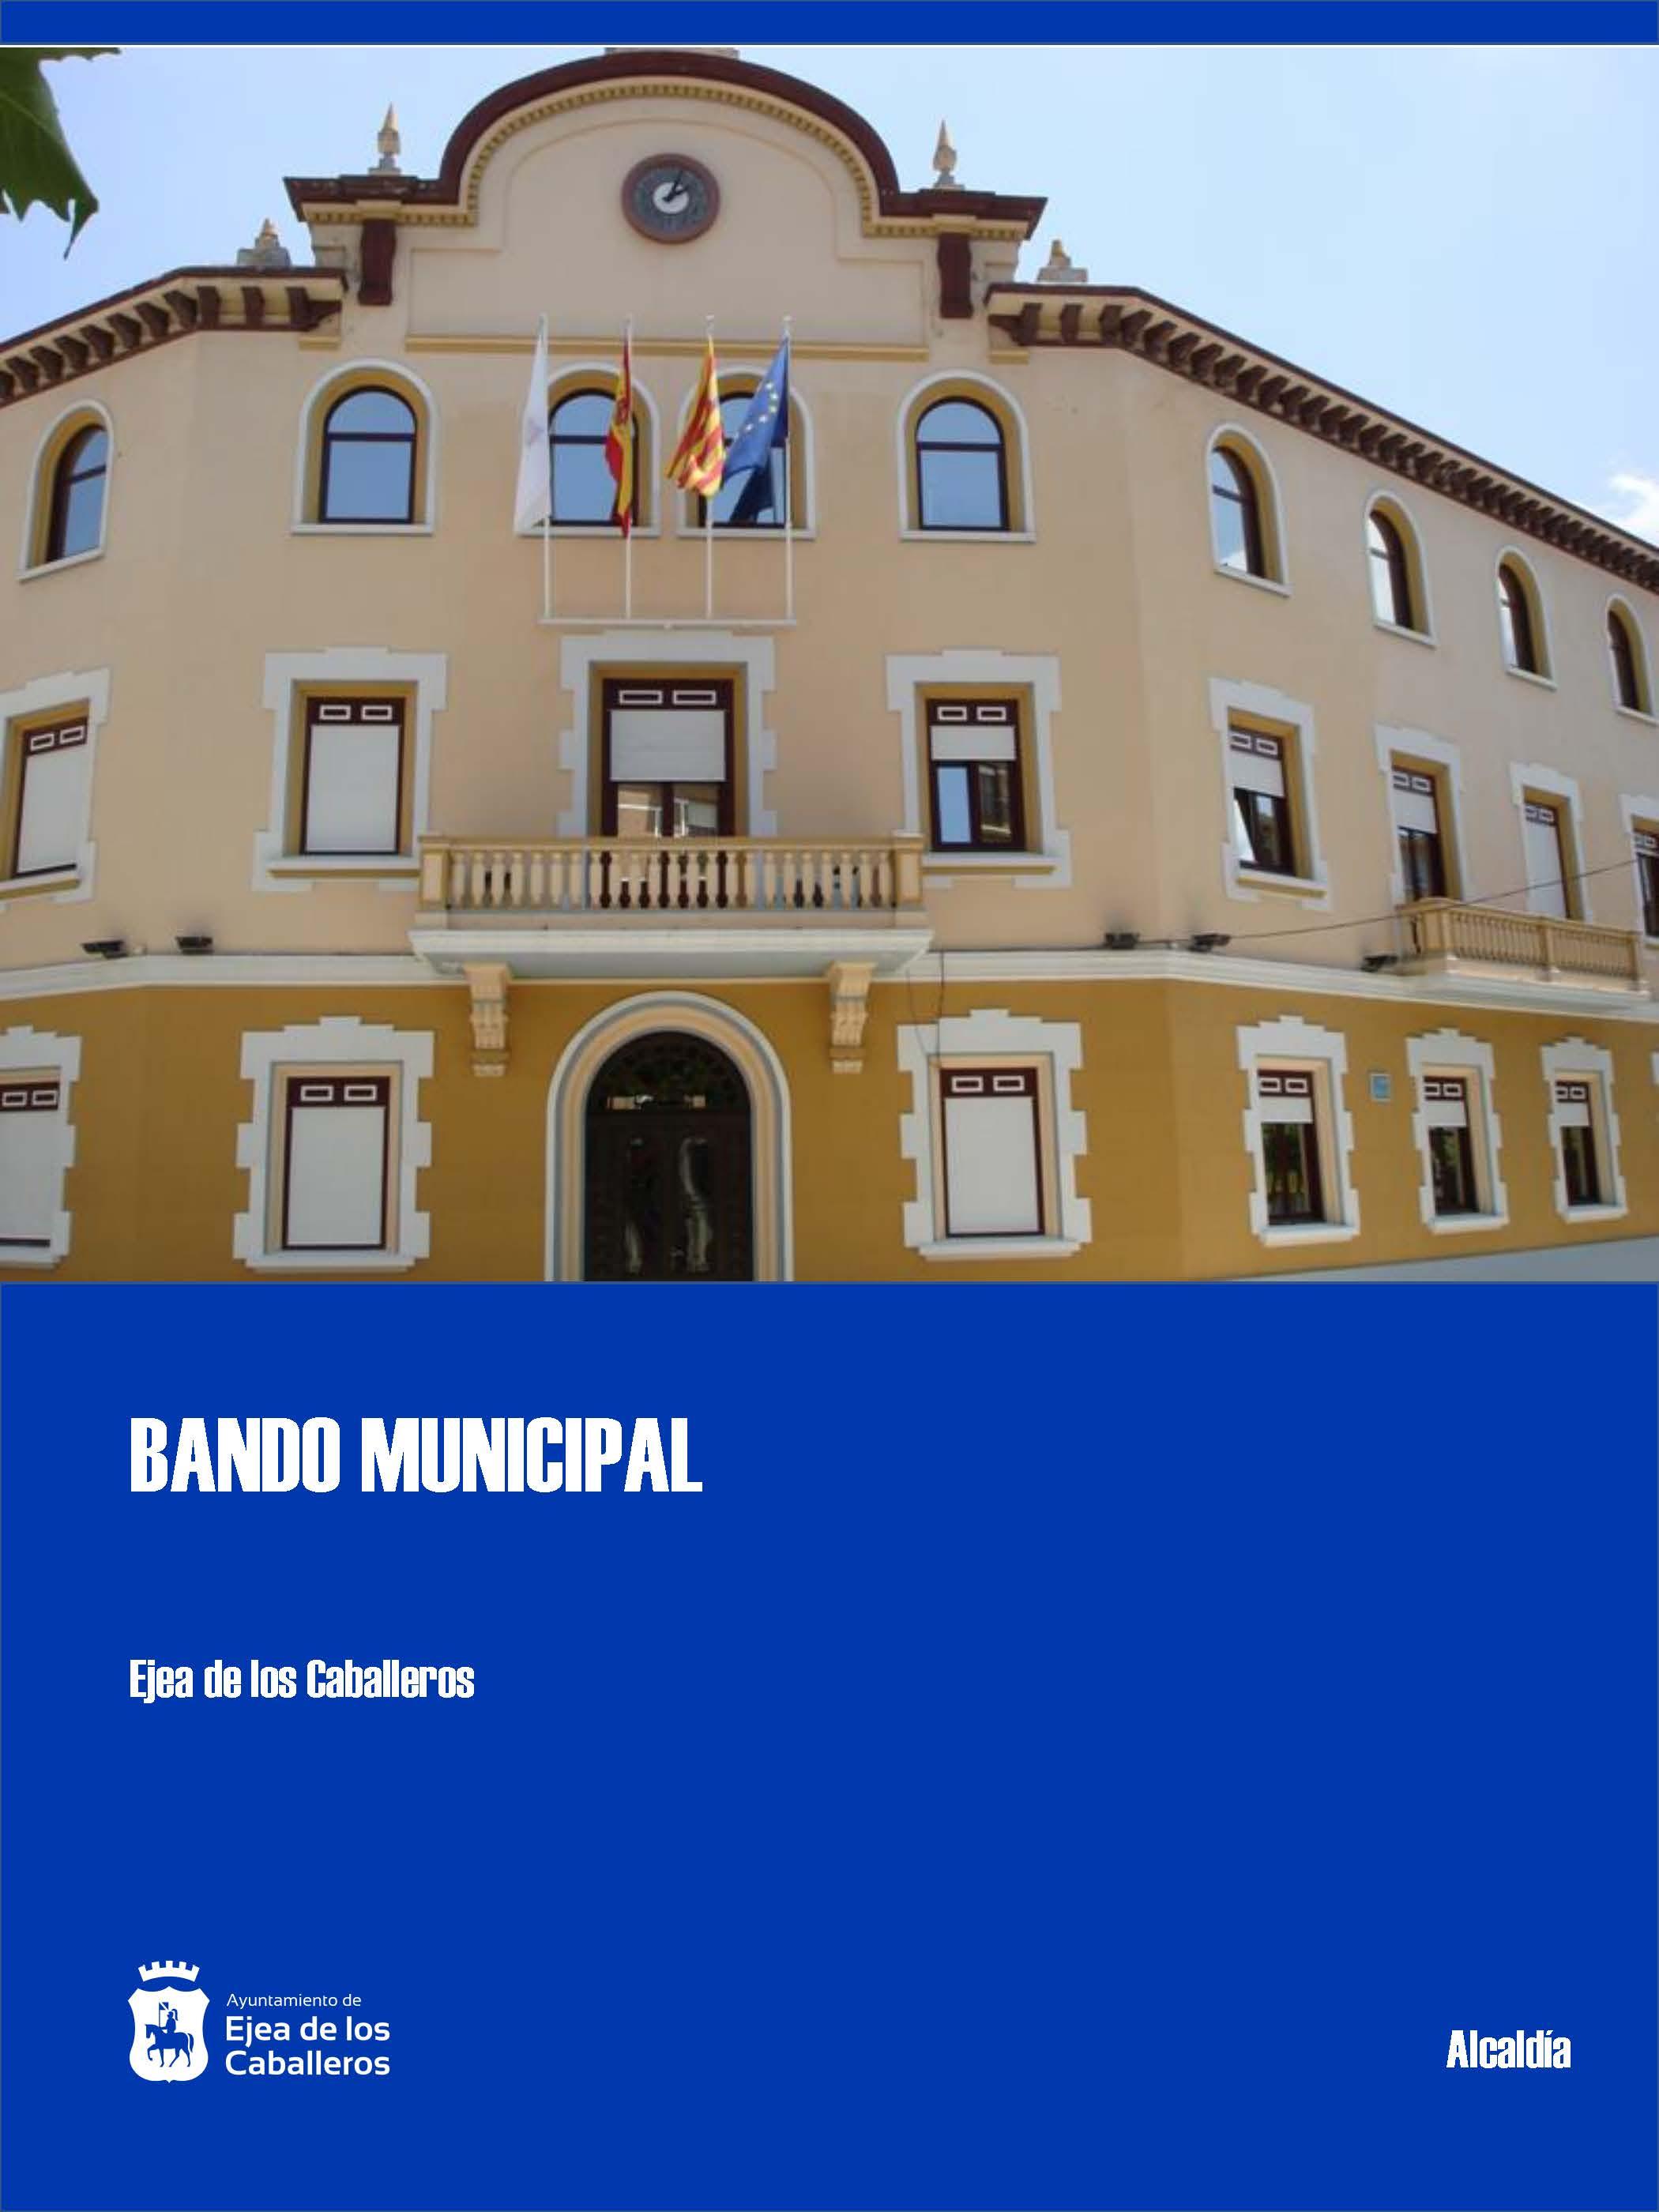 BANDO MUNICIPAL